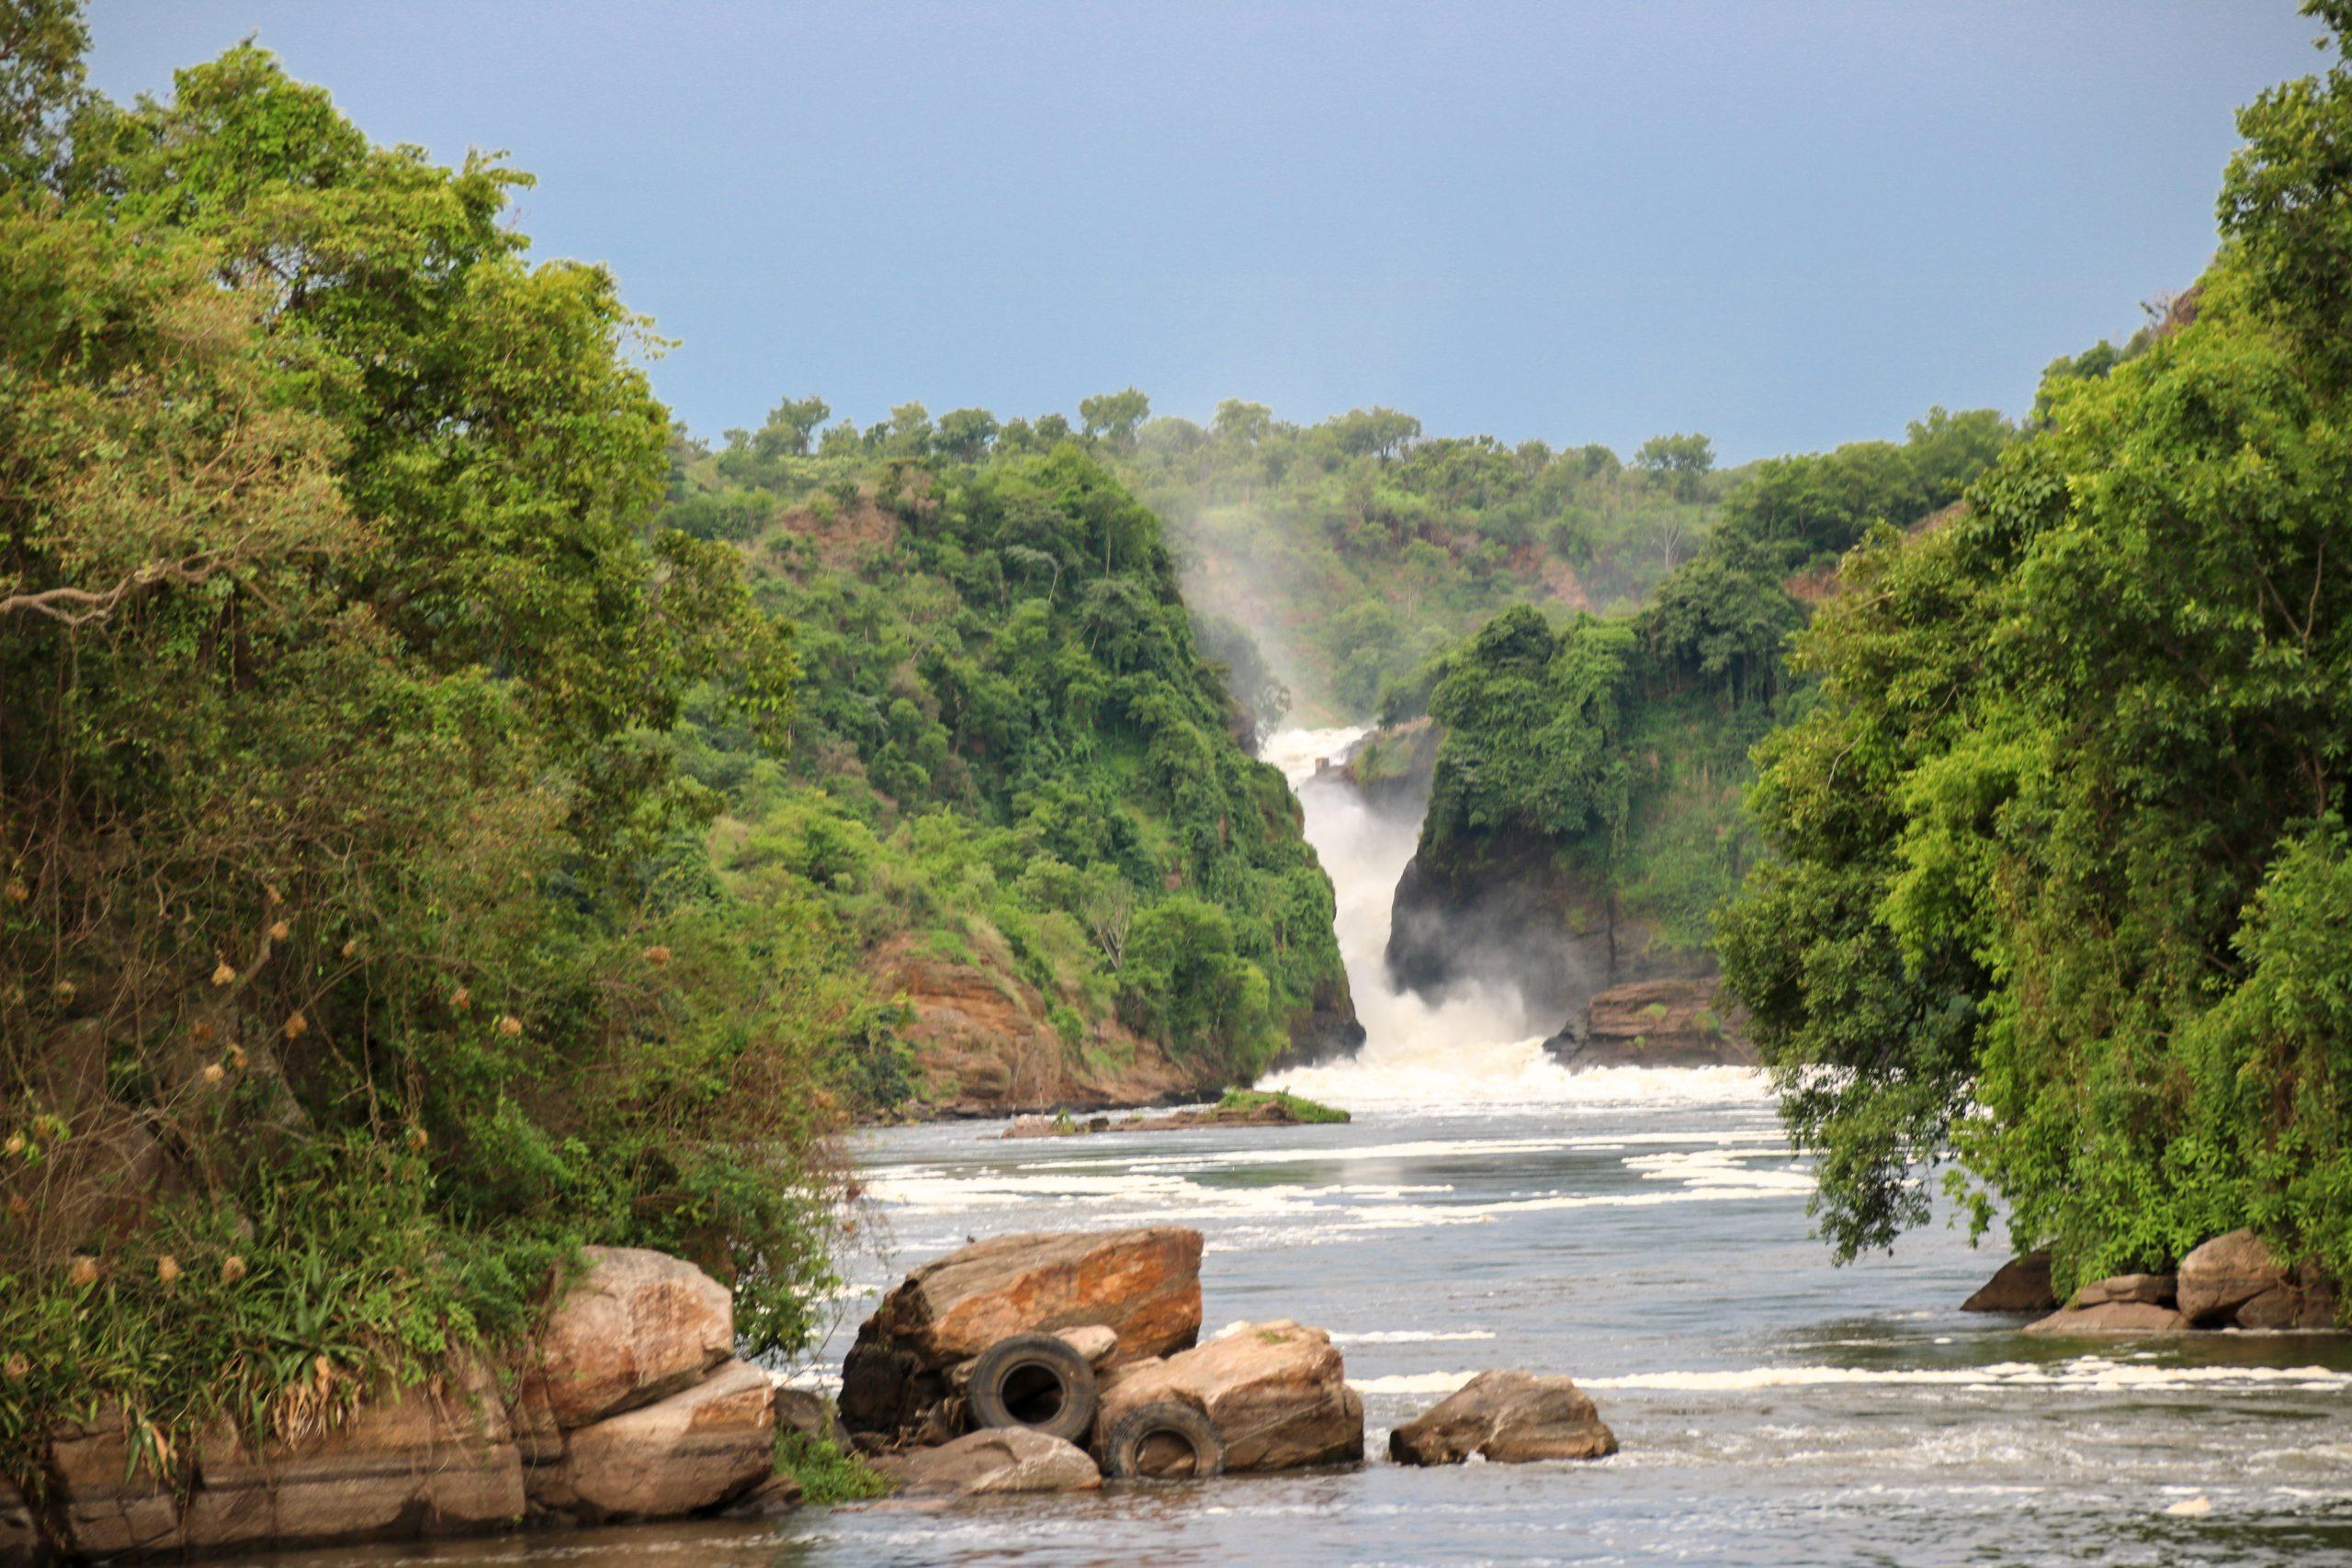 Self-drive safari in Murchison Falls NP